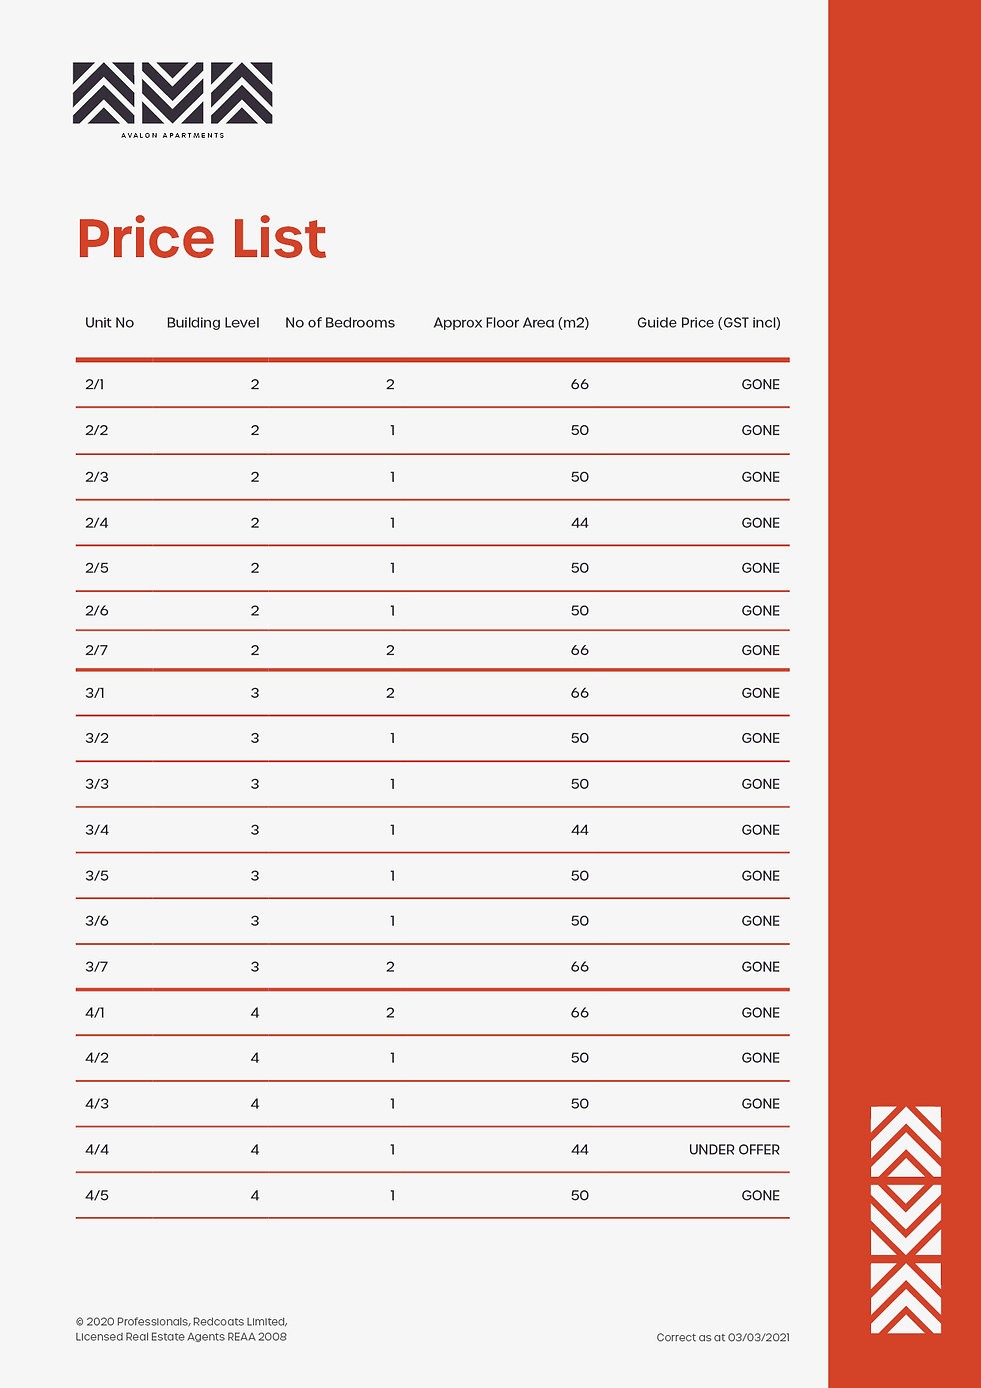 AA - Price List.jpg